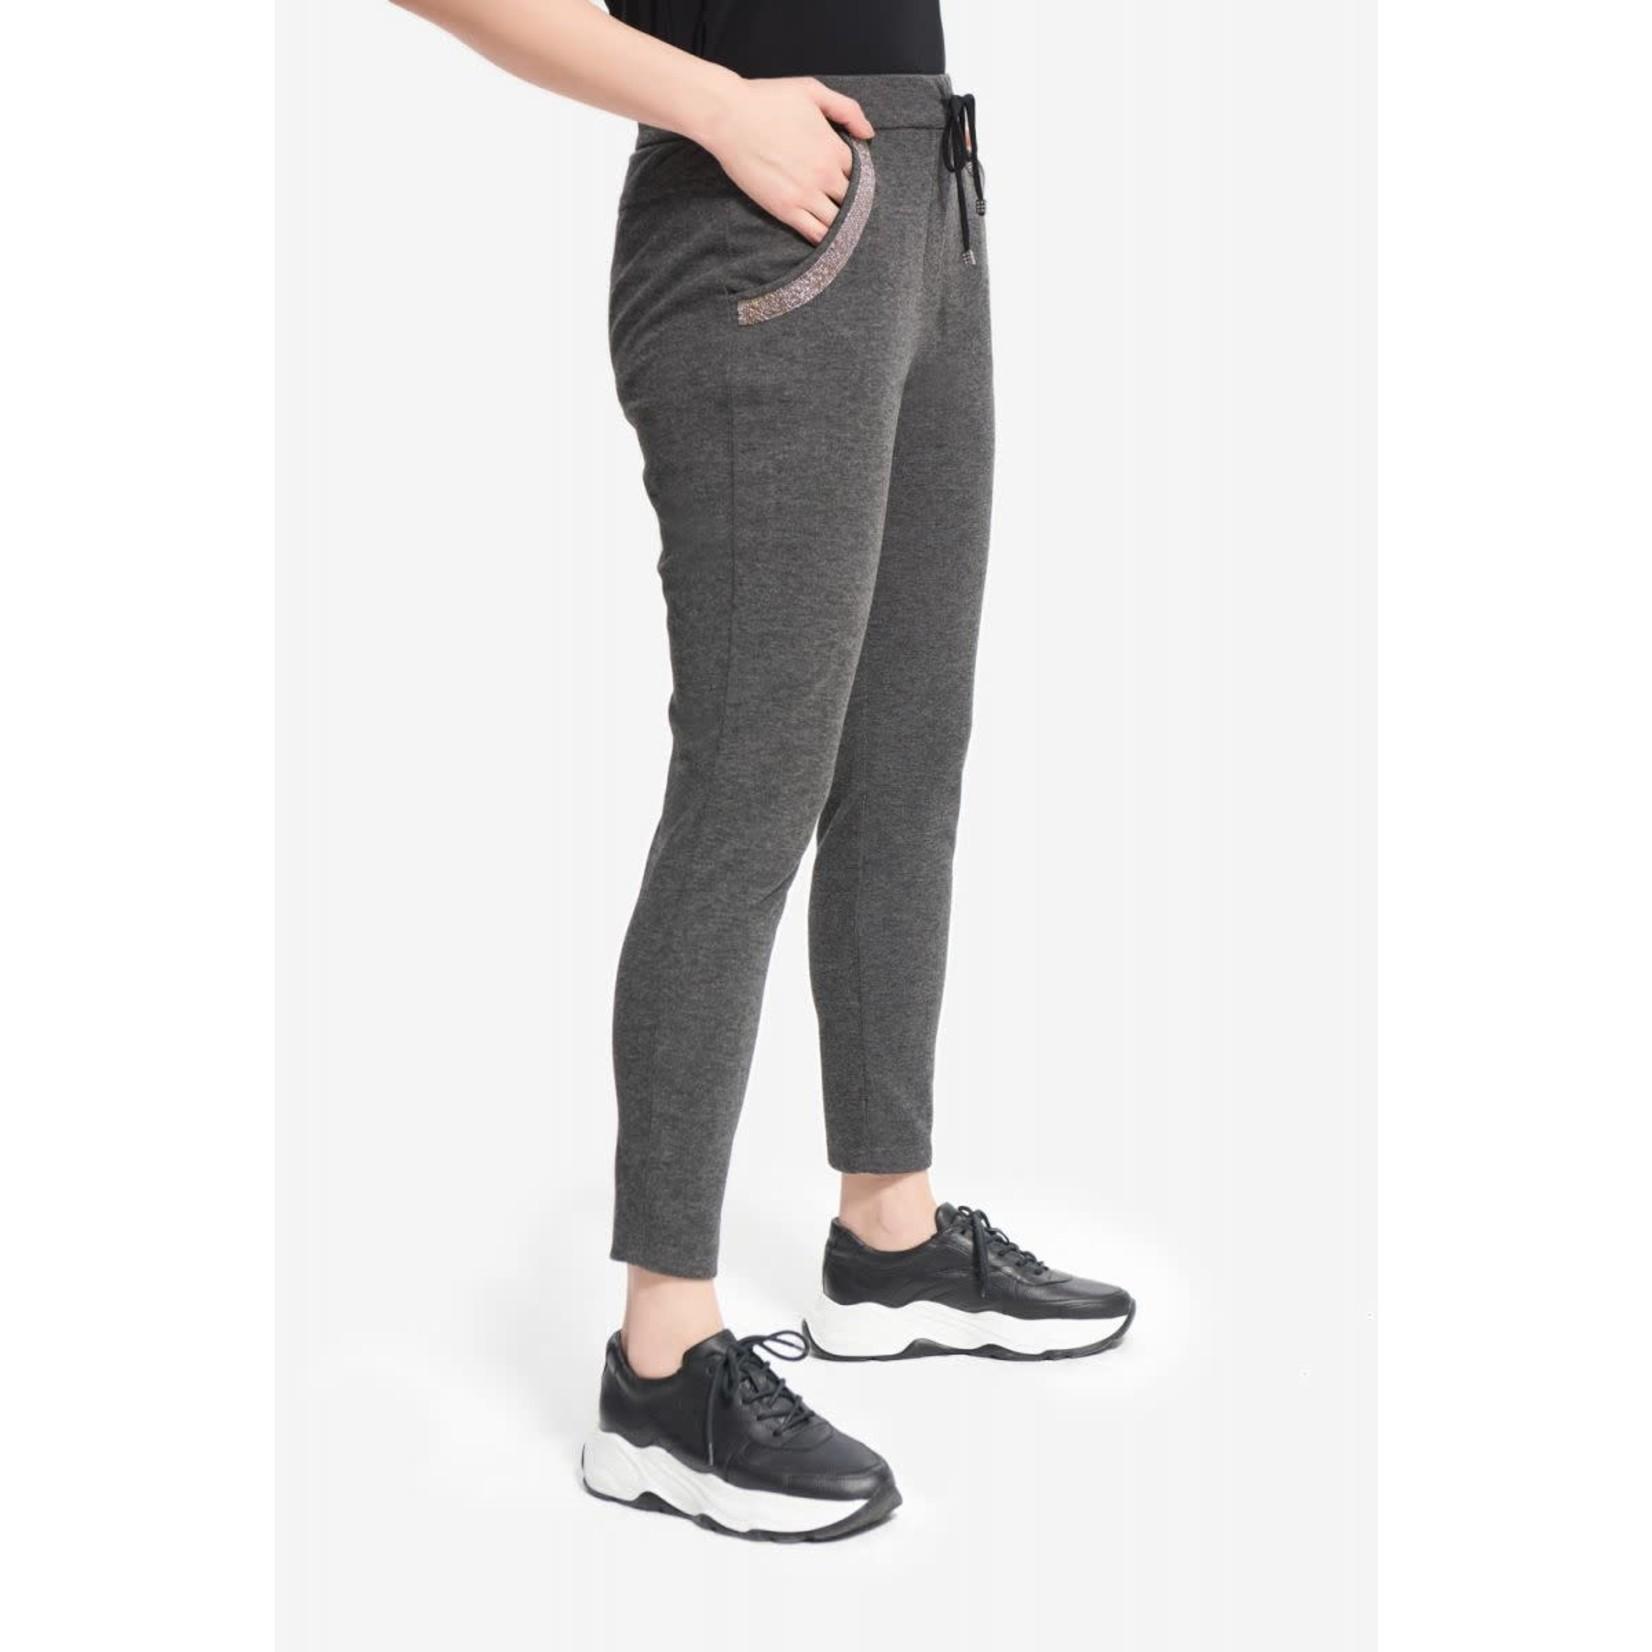 Joseph Ribkoff Rhinestone Joggers Style 214144